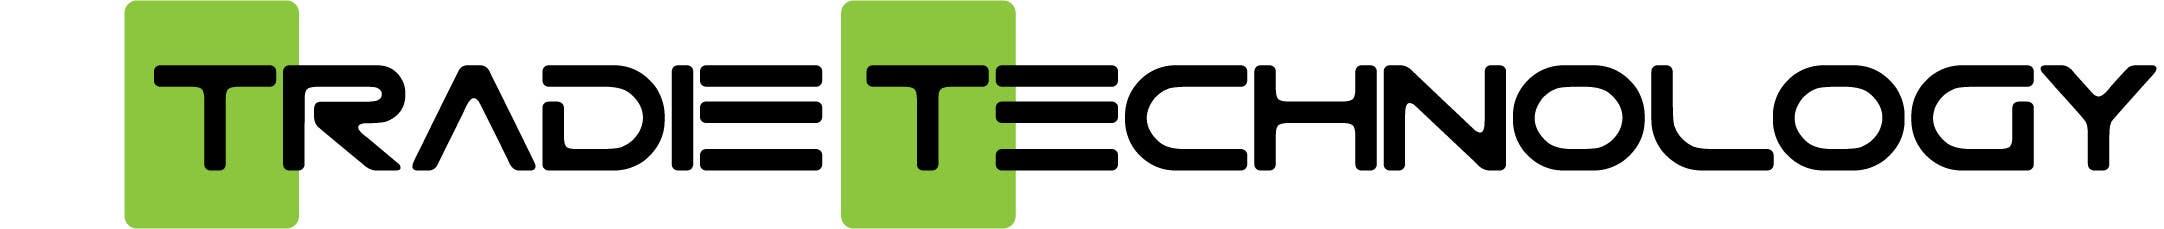 Bài tham dự cuộc thi #4 cho Design a Logo for Tradie Technology